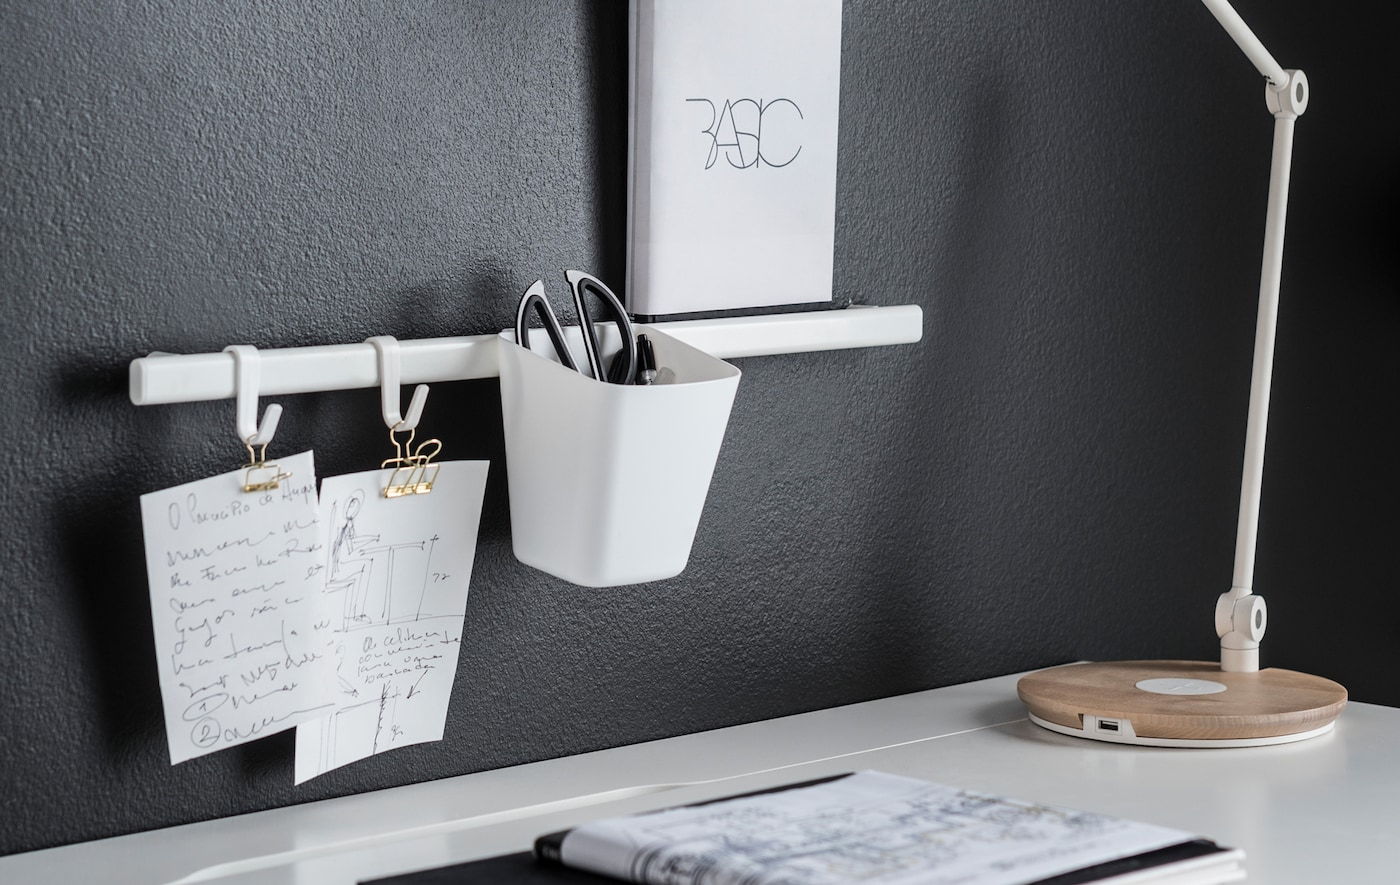 haushaltsorganisation mit stangen ikea. Black Bedroom Furniture Sets. Home Design Ideas